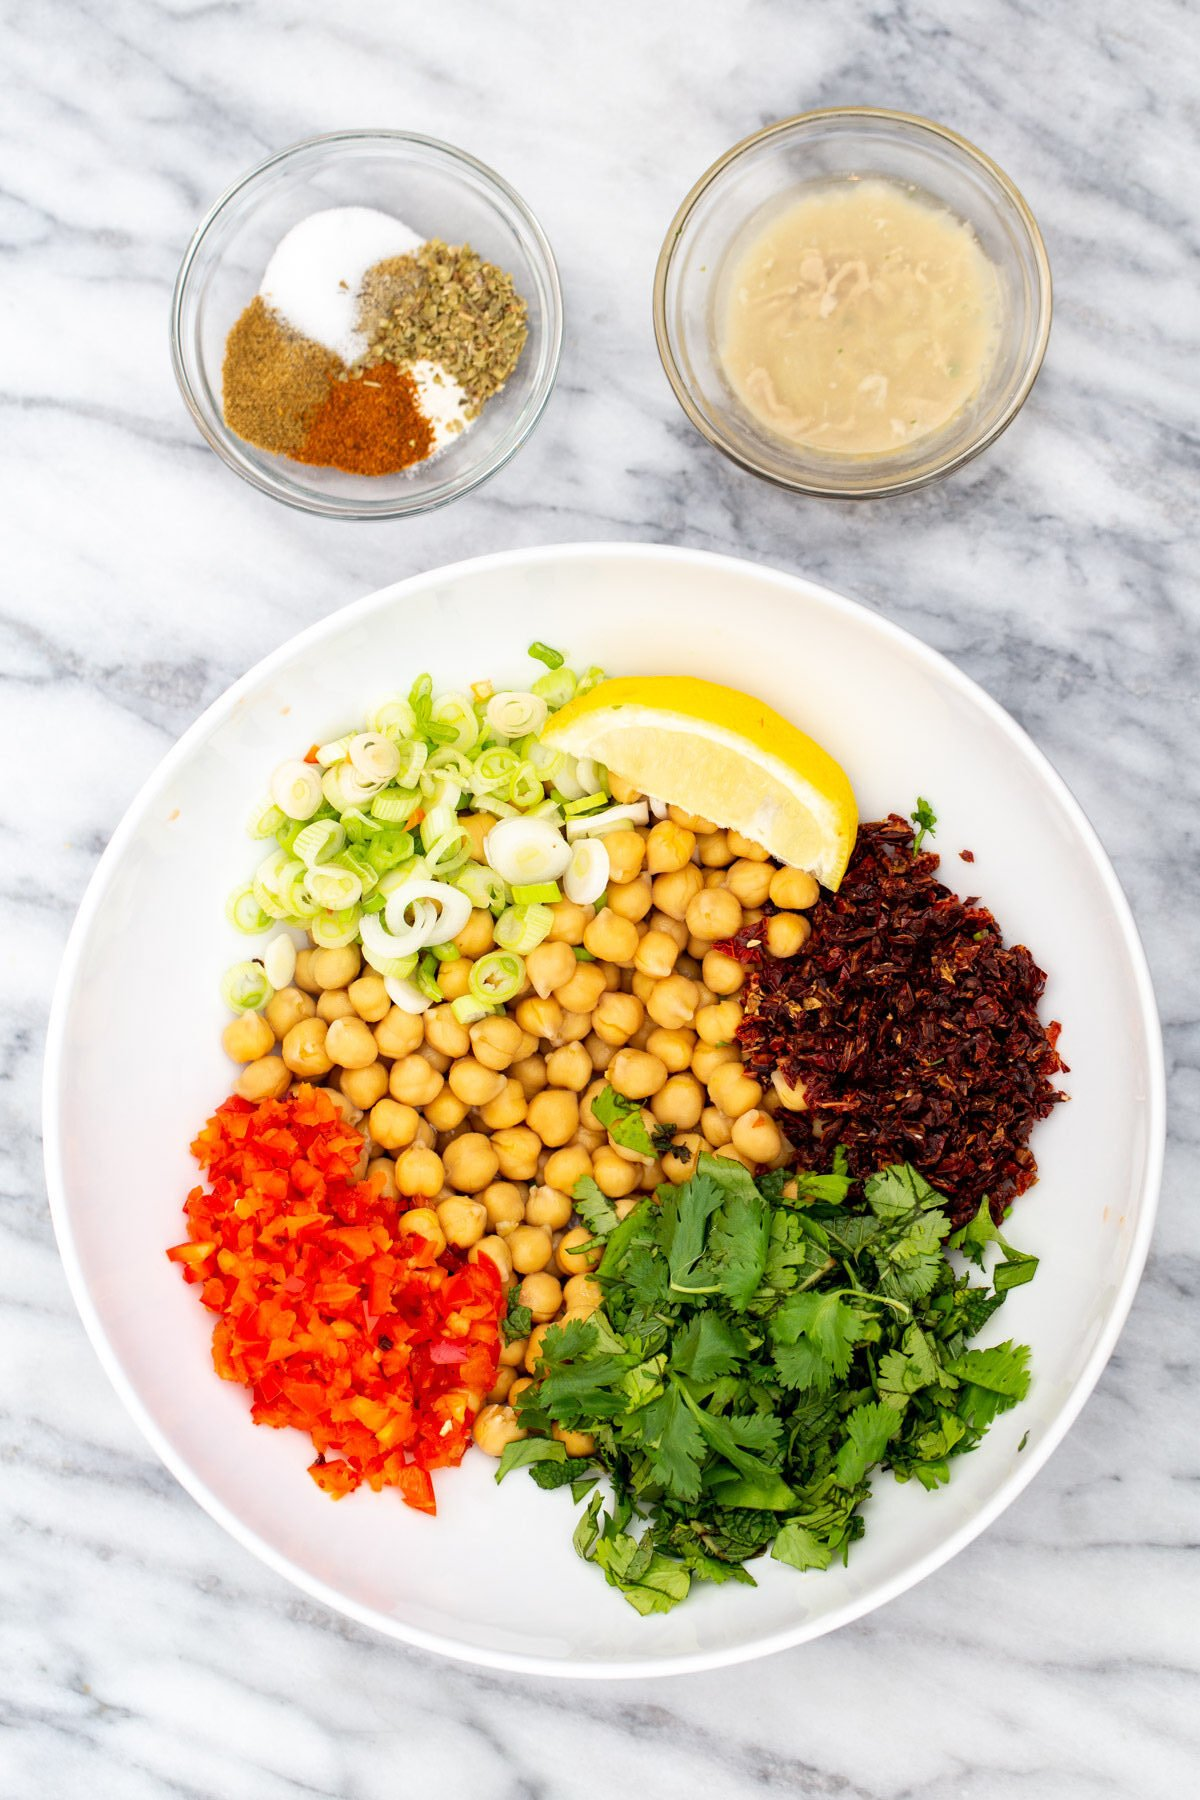 ingredients needed for making vegan Mediterranean chickpea salad